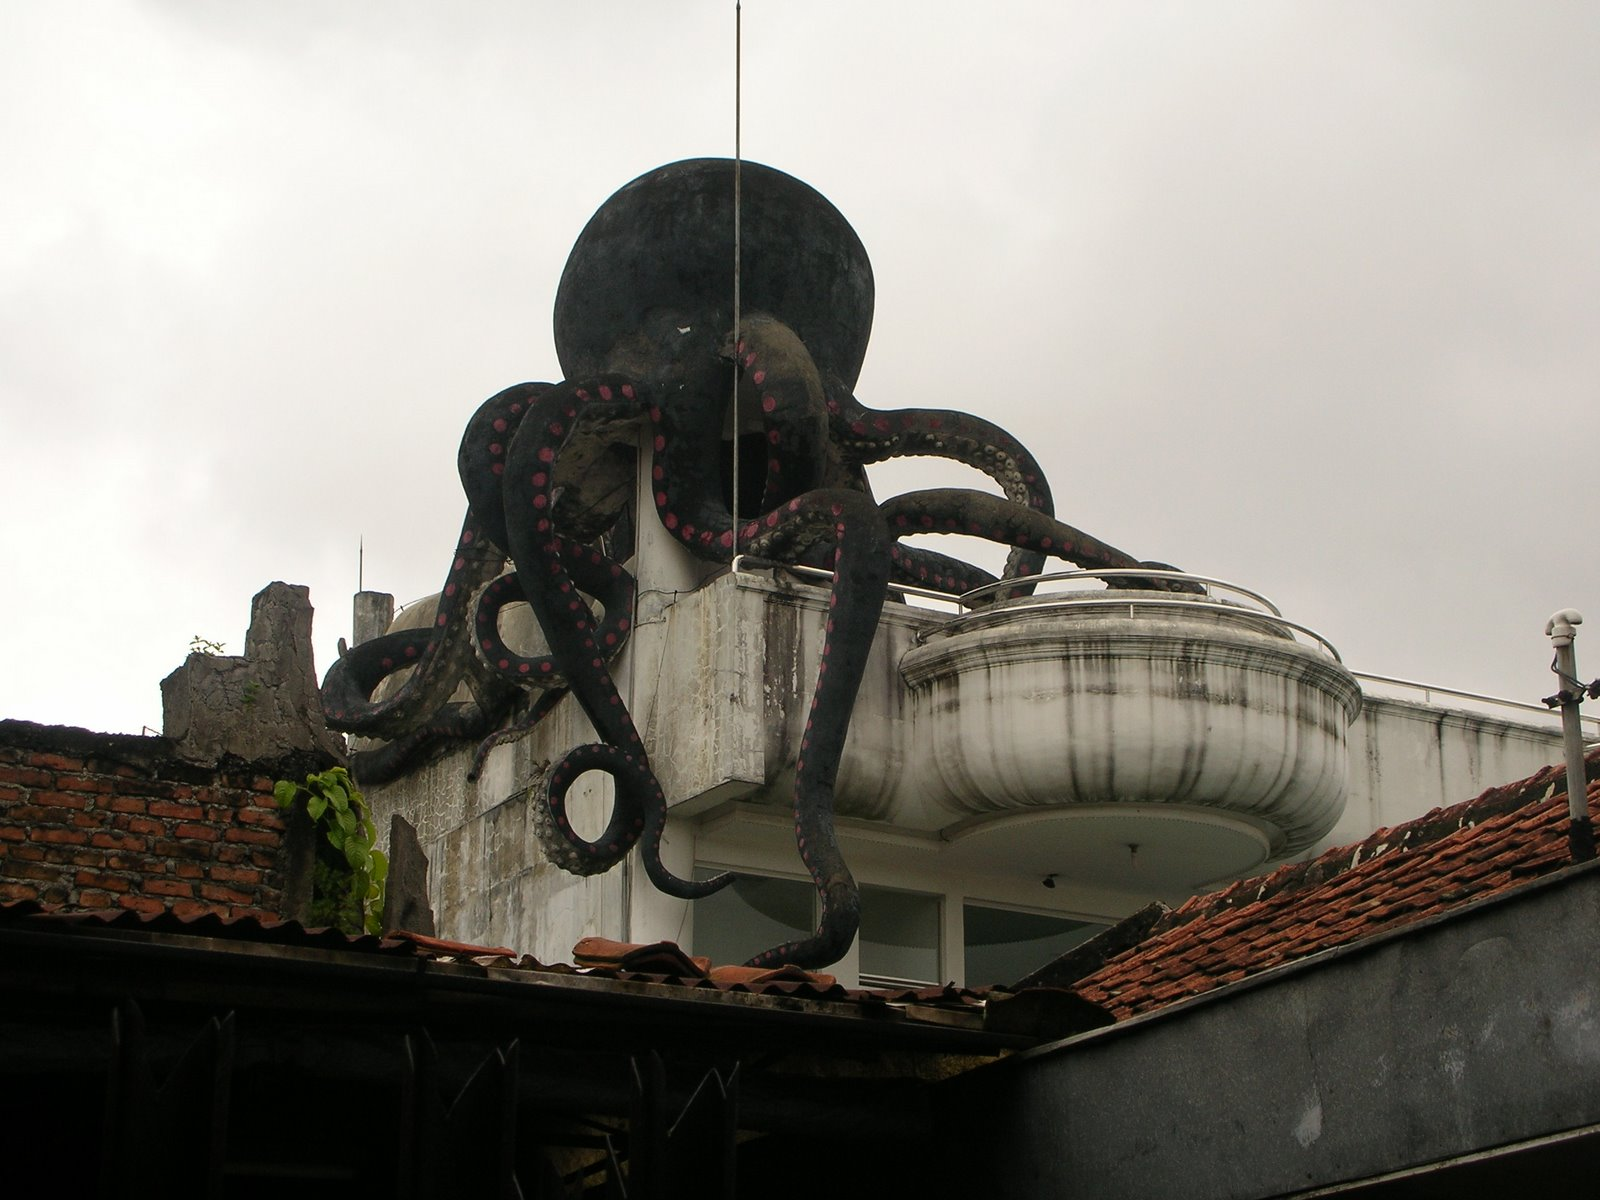 Misteri Rumah Gurita di Bandung Konon Banyak Setan